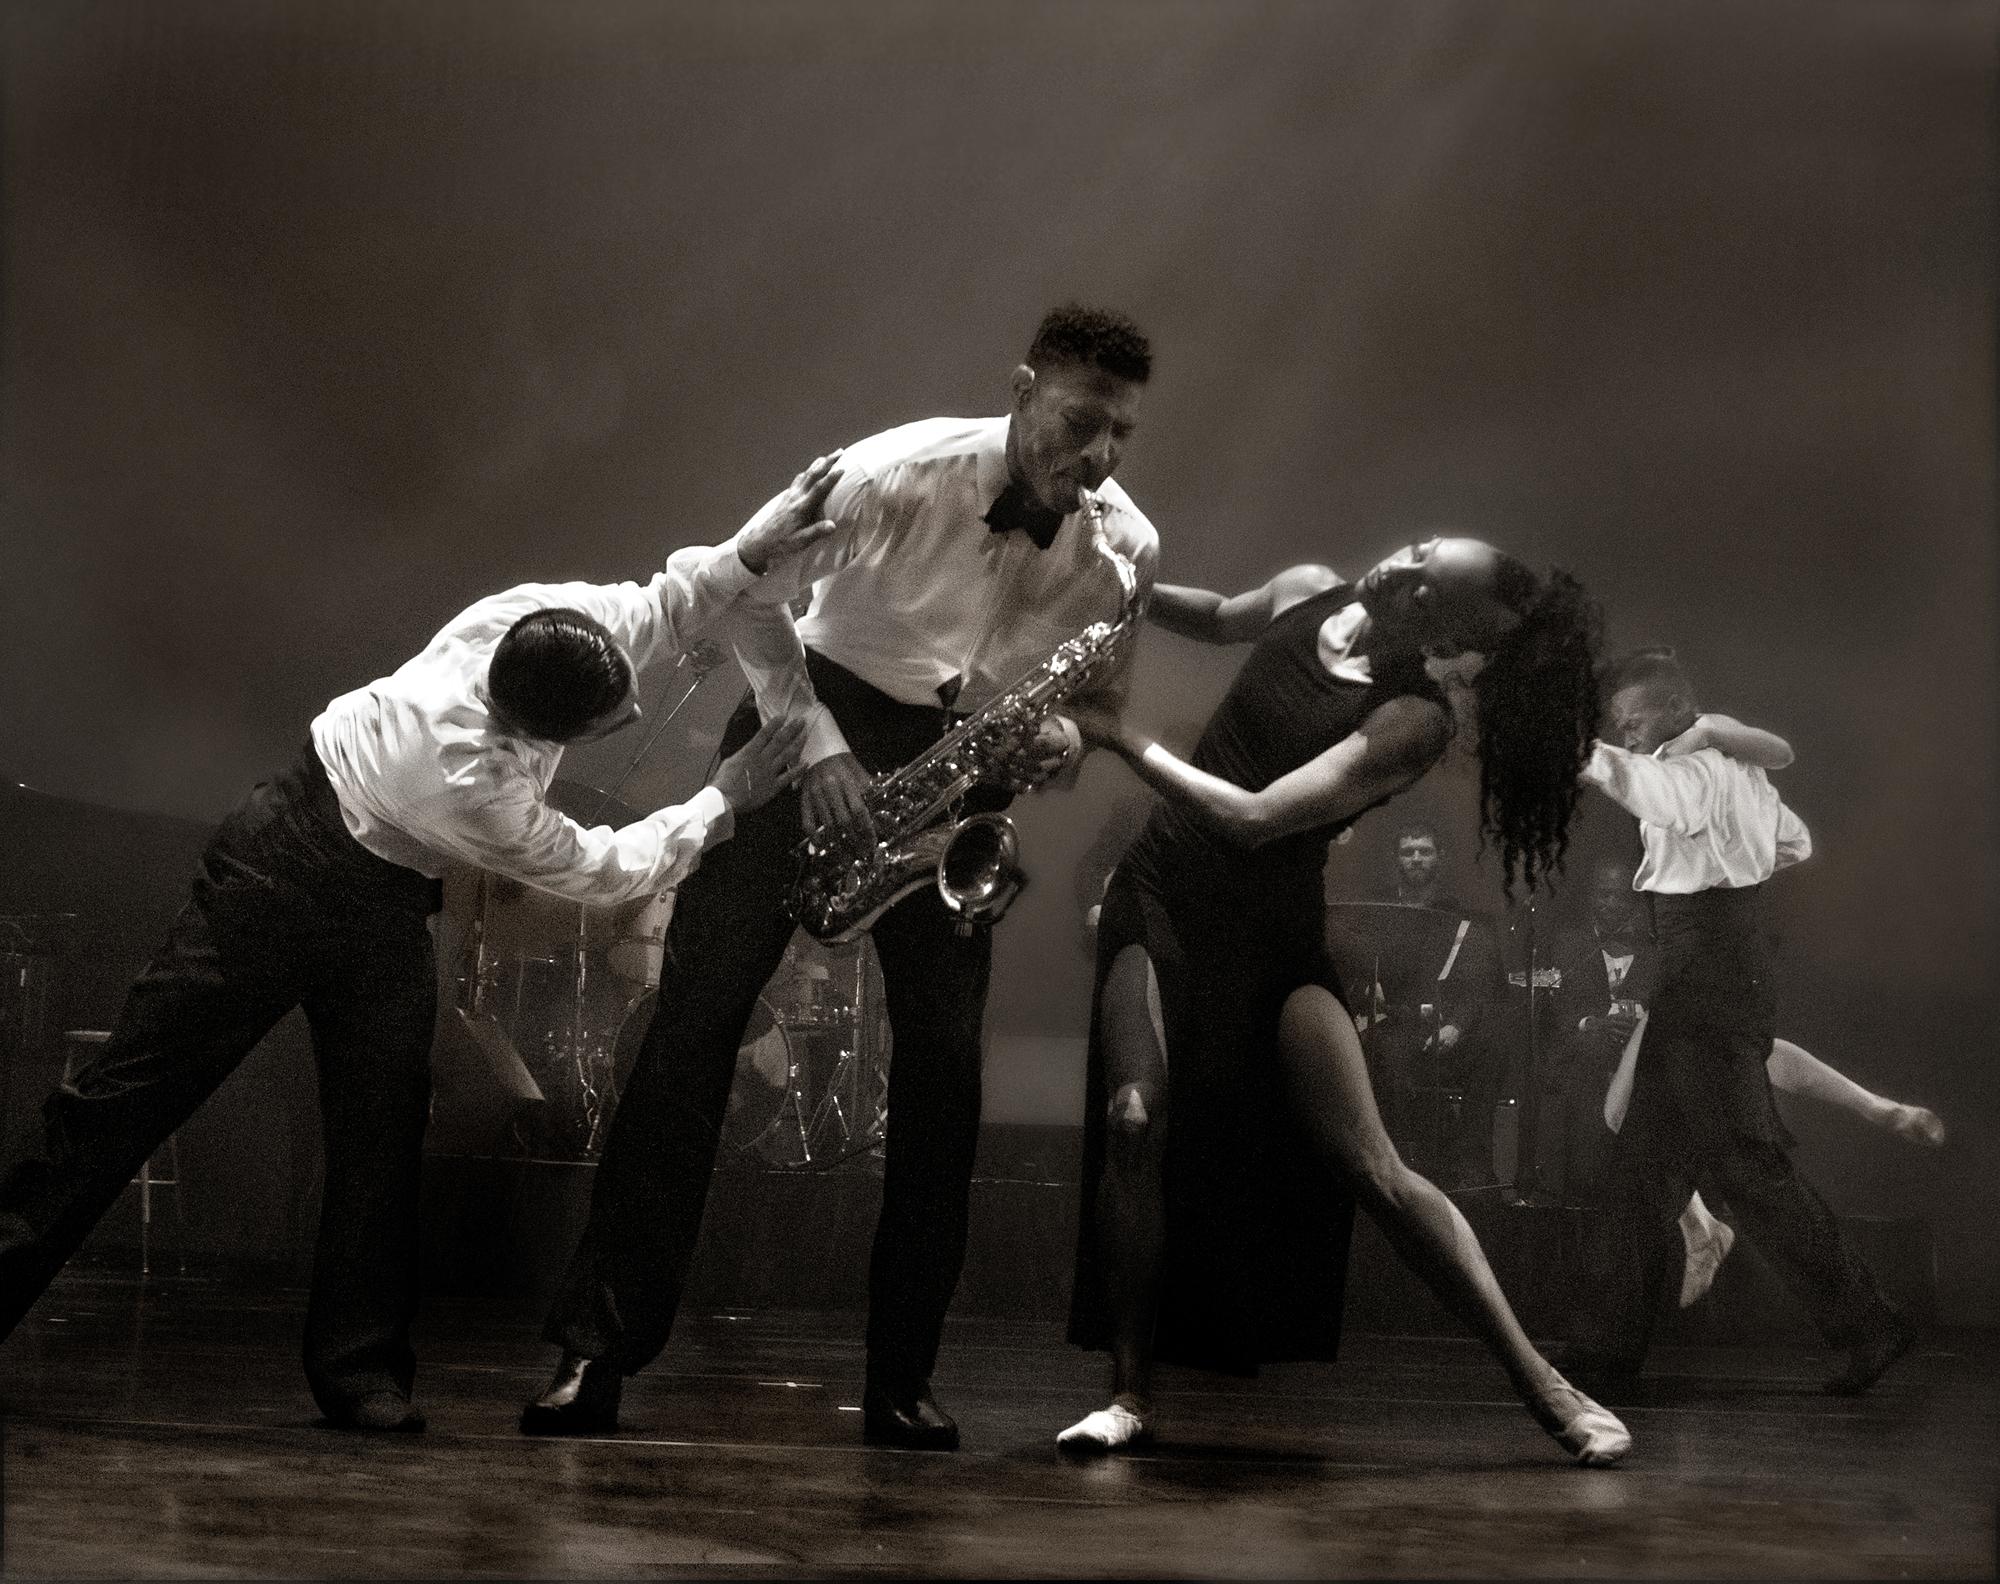 Adeline Sides  Saxophonist With Dancers